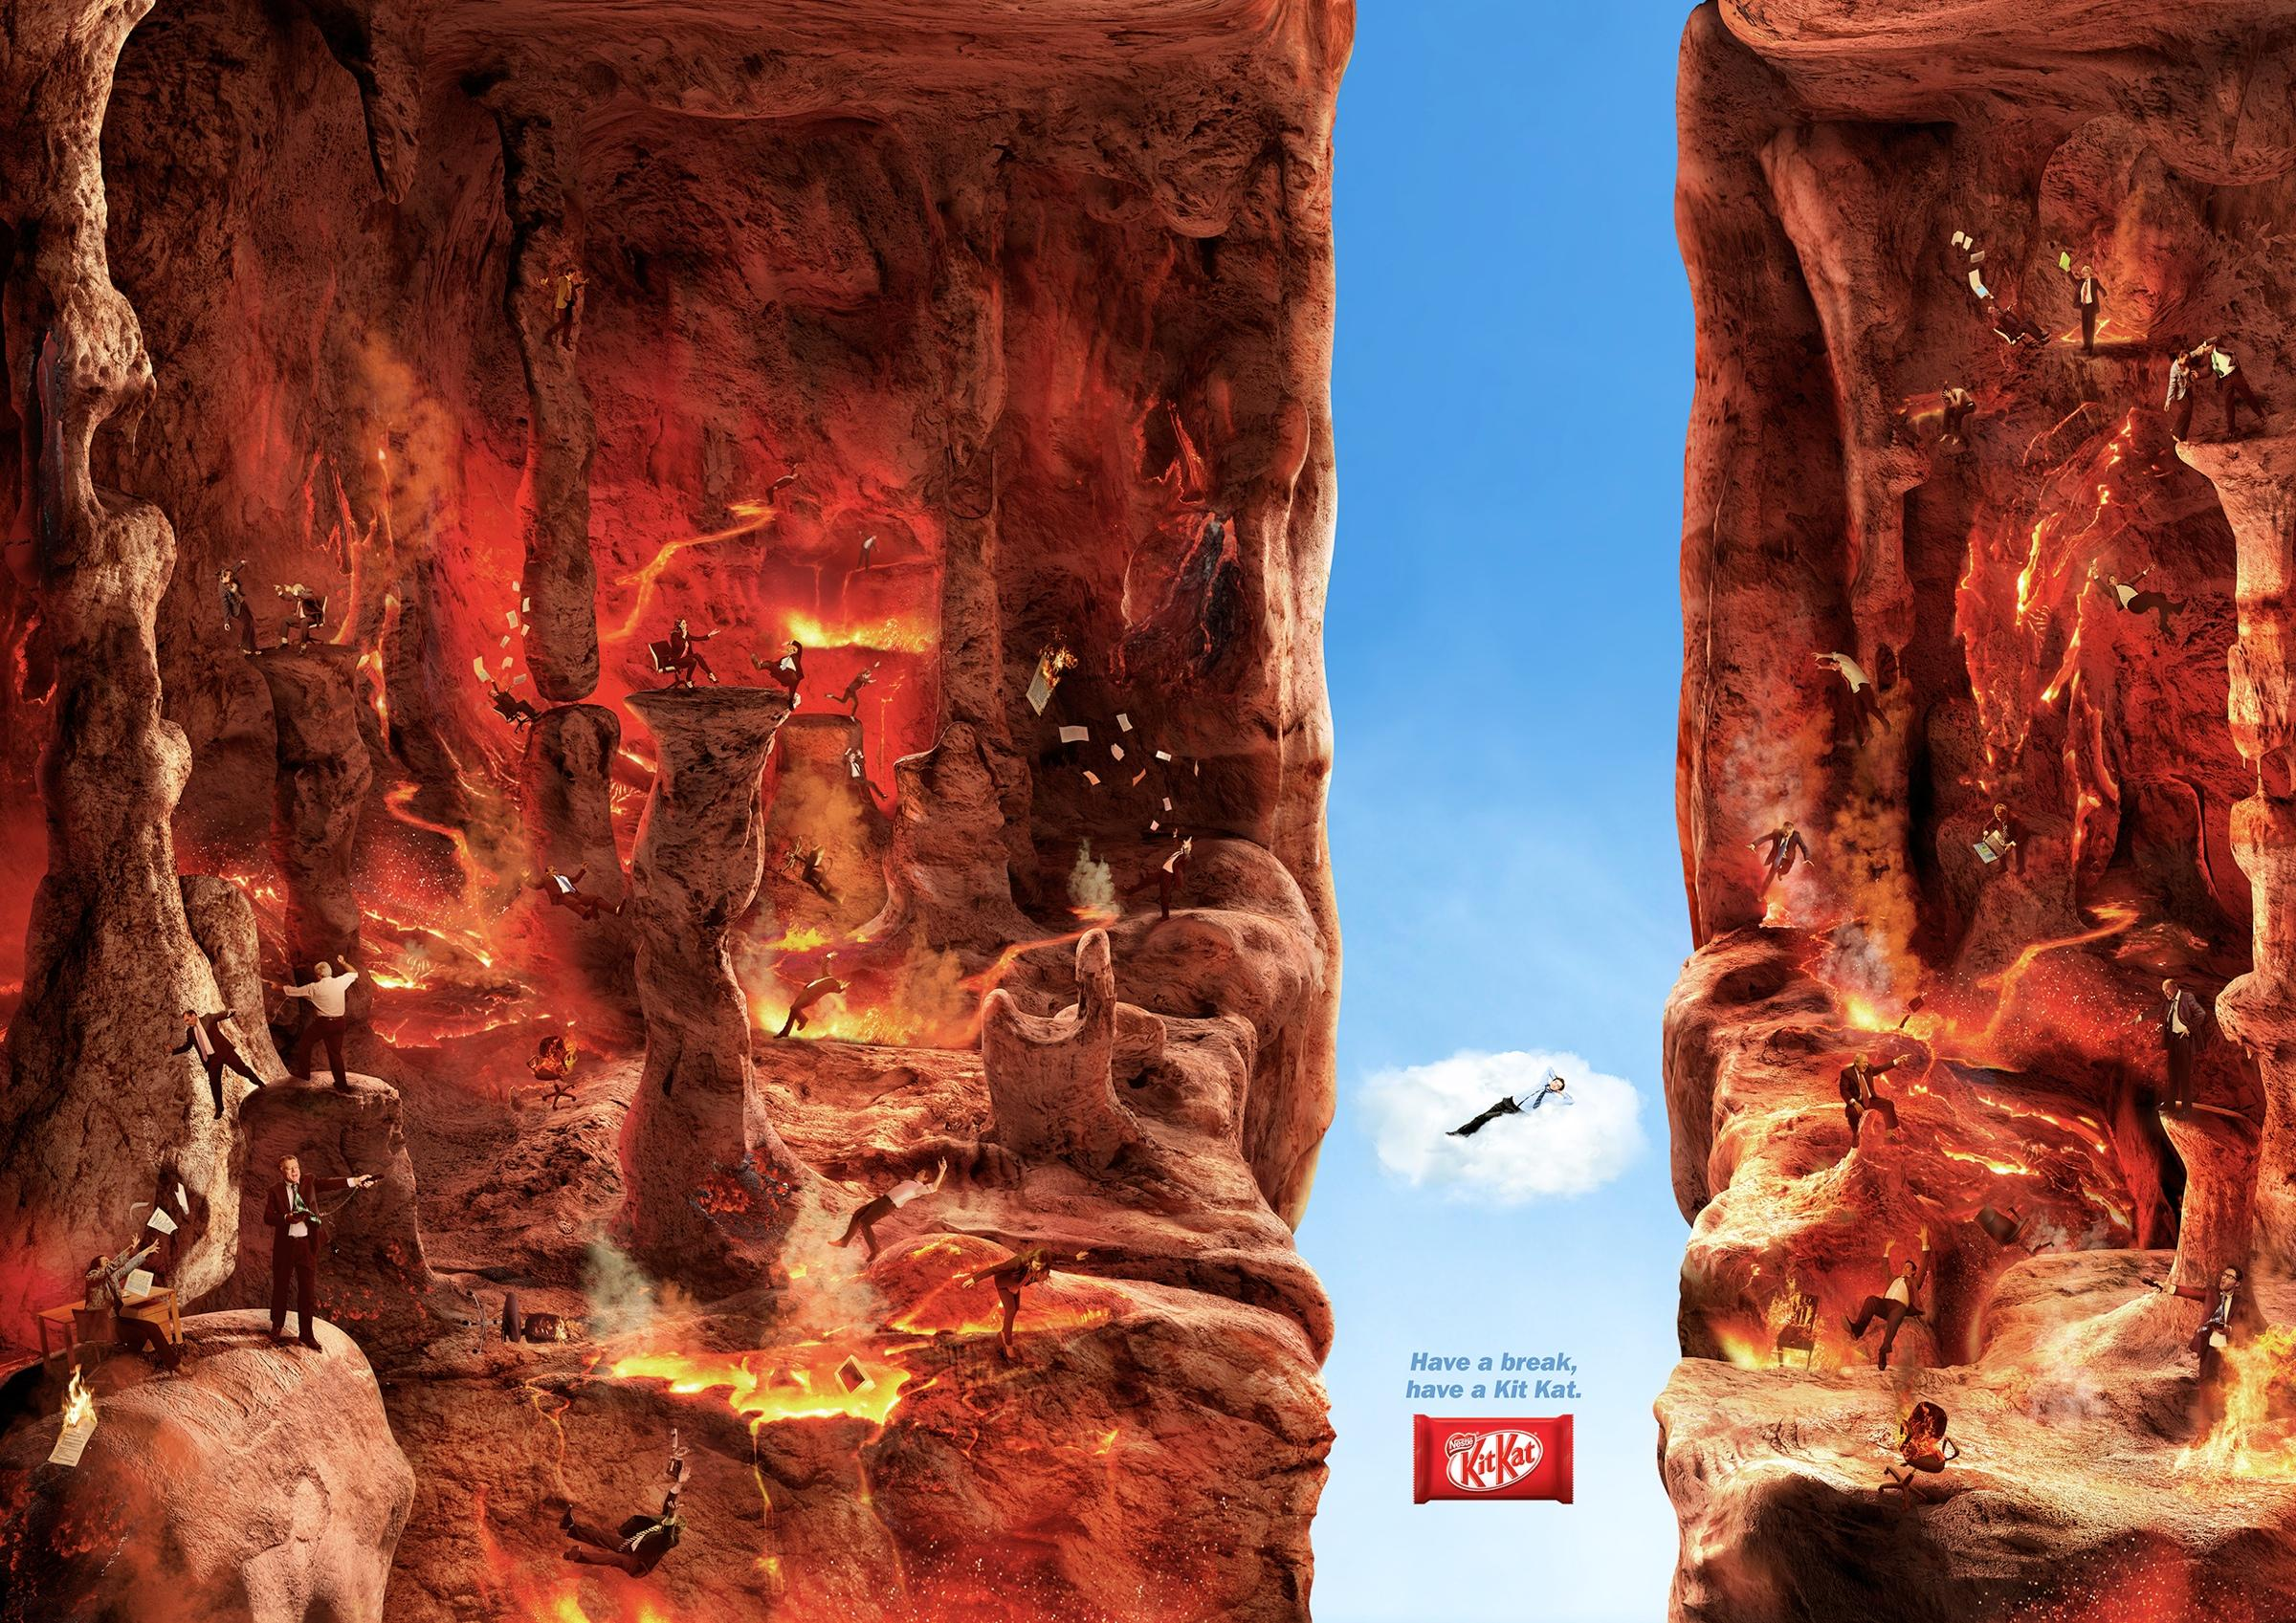 Kit Kat Print Ad -  Break, Hell